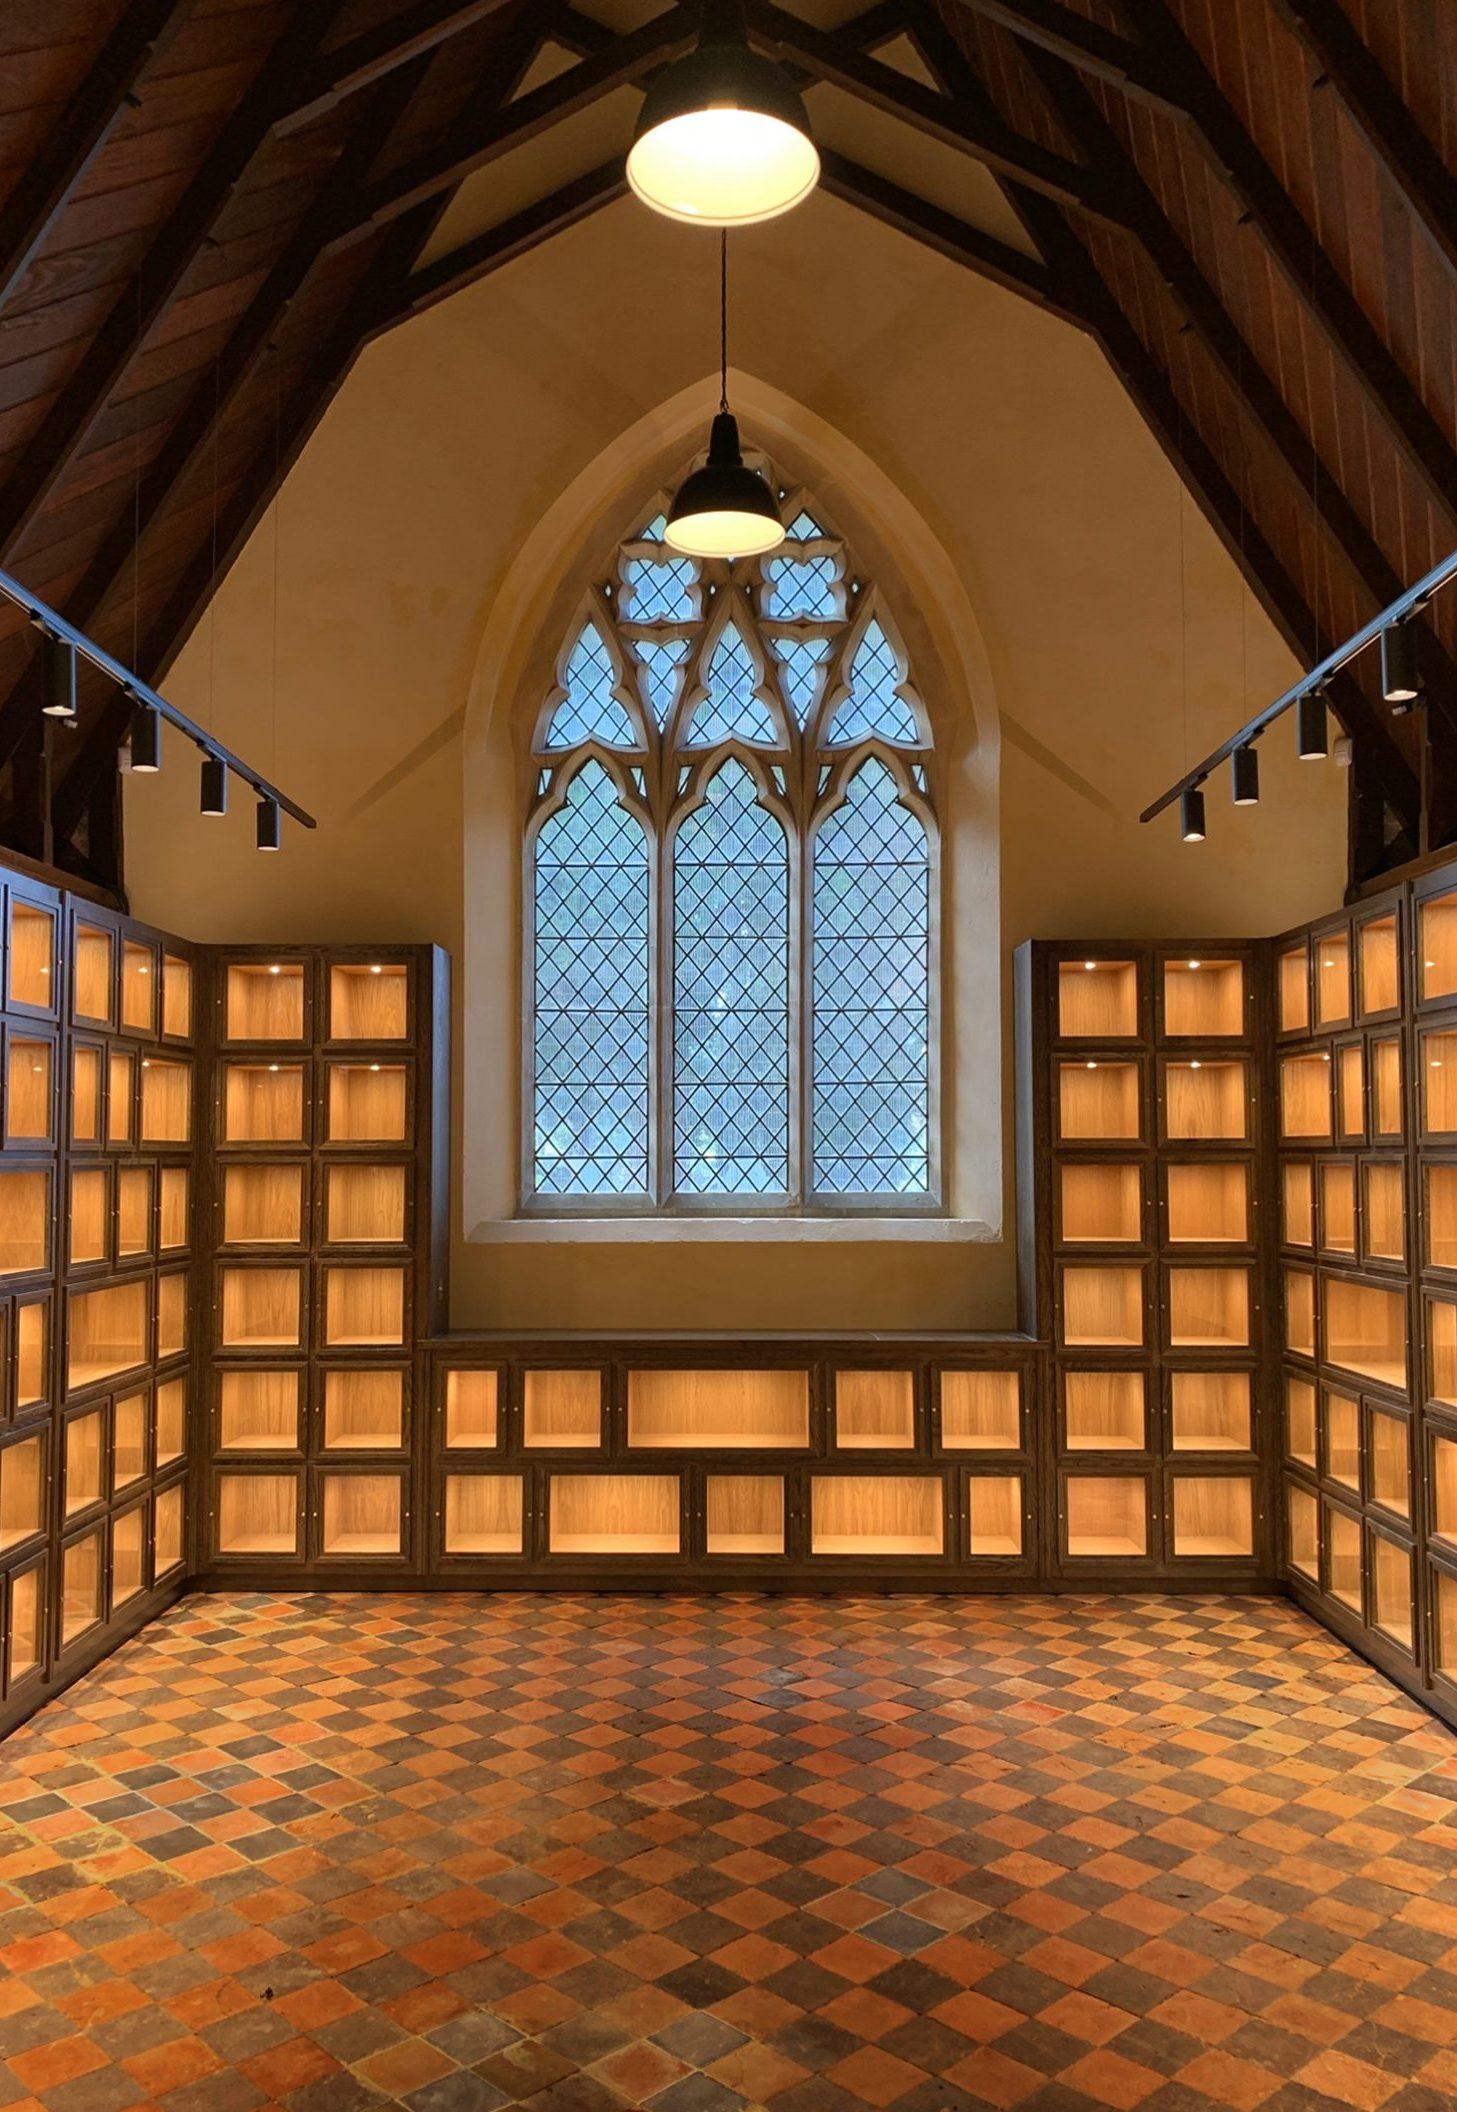 Fairmile, Fairmile Cemetery, Restoration, Renovation, Victorian Chapel, Columbarium, WWA Studios, WWA, West Waddy Archadia, Archadia, West Waddy, Architects, Town Planners, Urban Designers, Heritage,